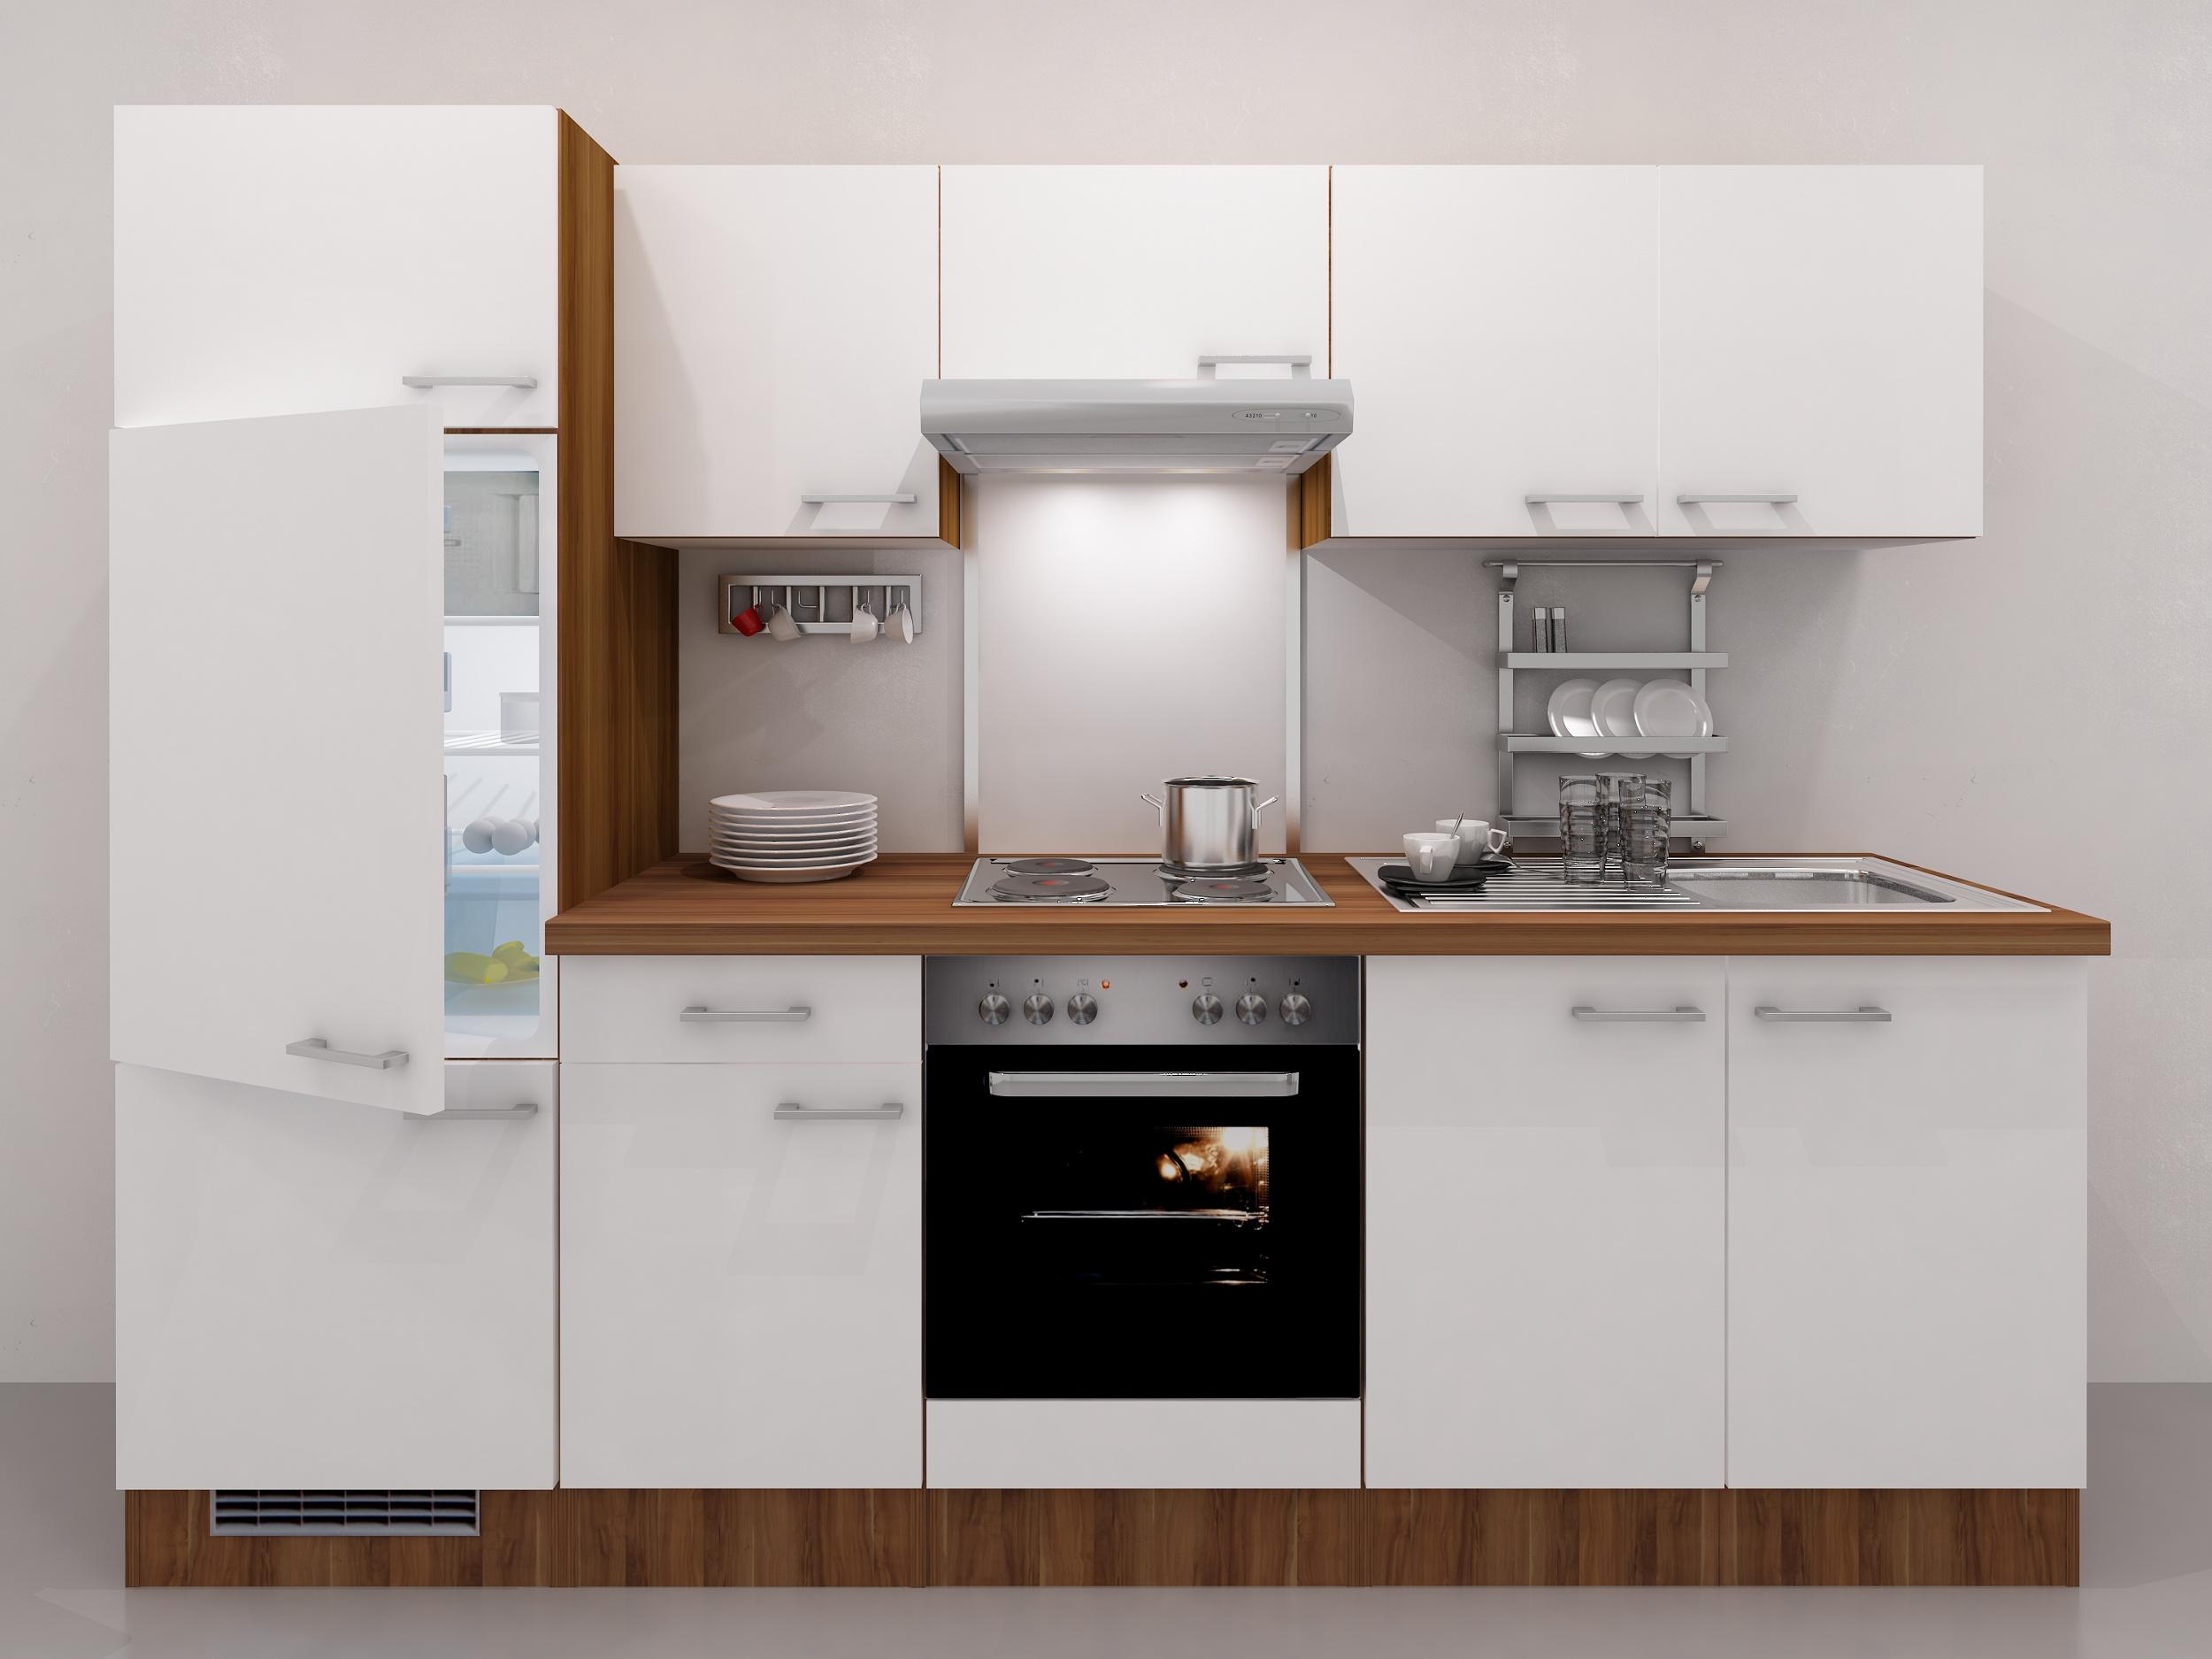 Kühlschrankumbau : Kühlschrankumbau cosmo küchenschrank umbauschrank 3 türen 60 cm